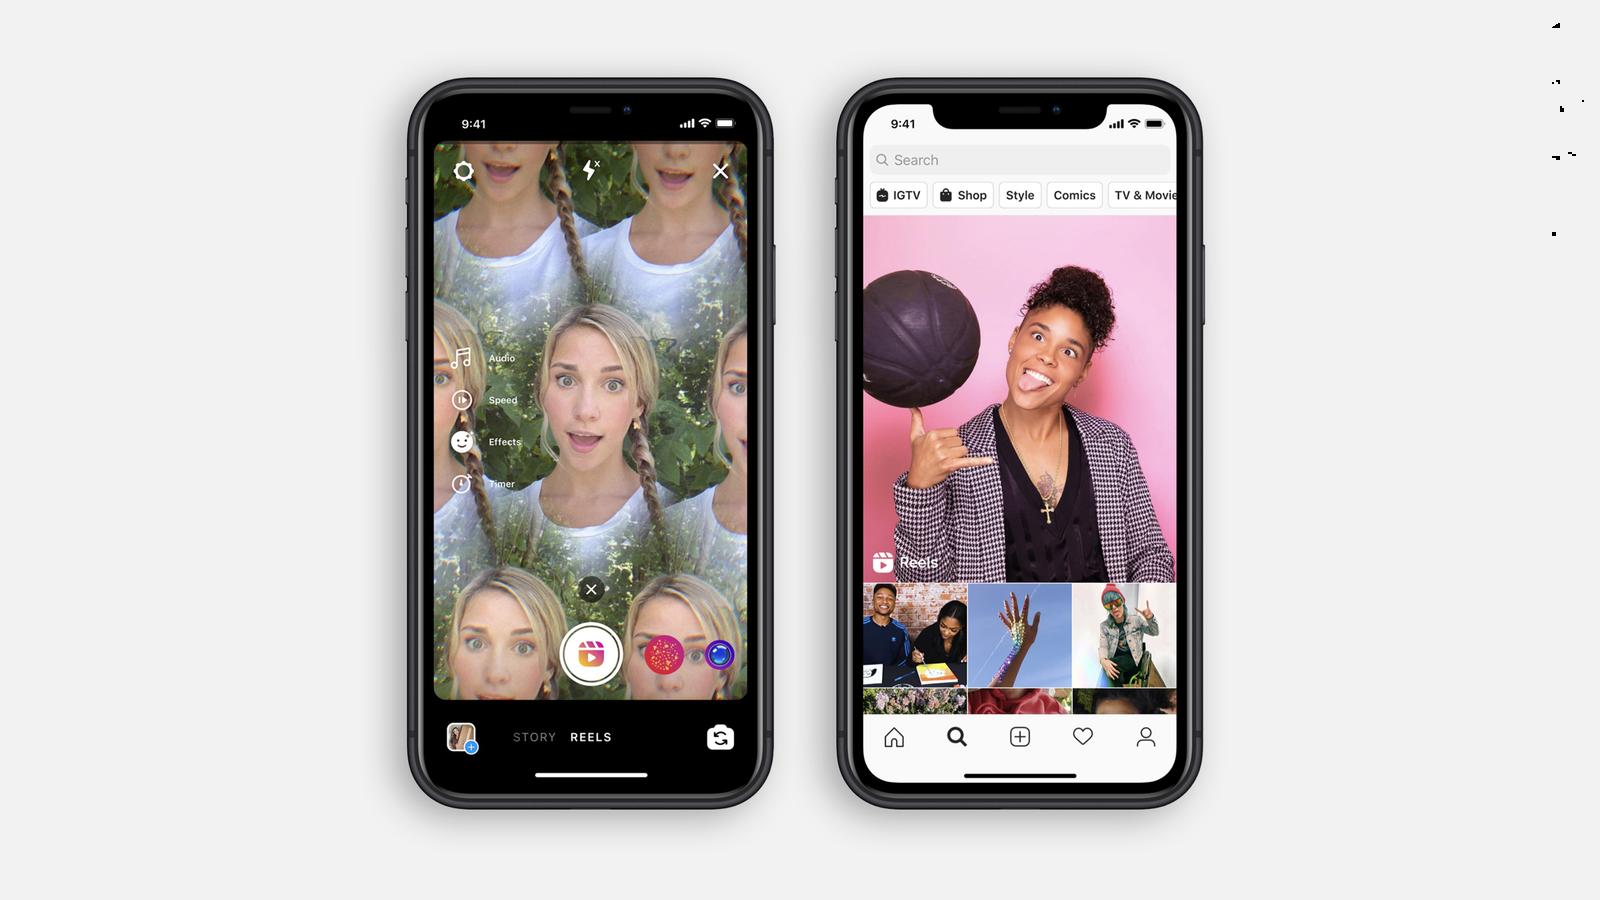 Instagram's TikTok copycat Reels is now available in the US